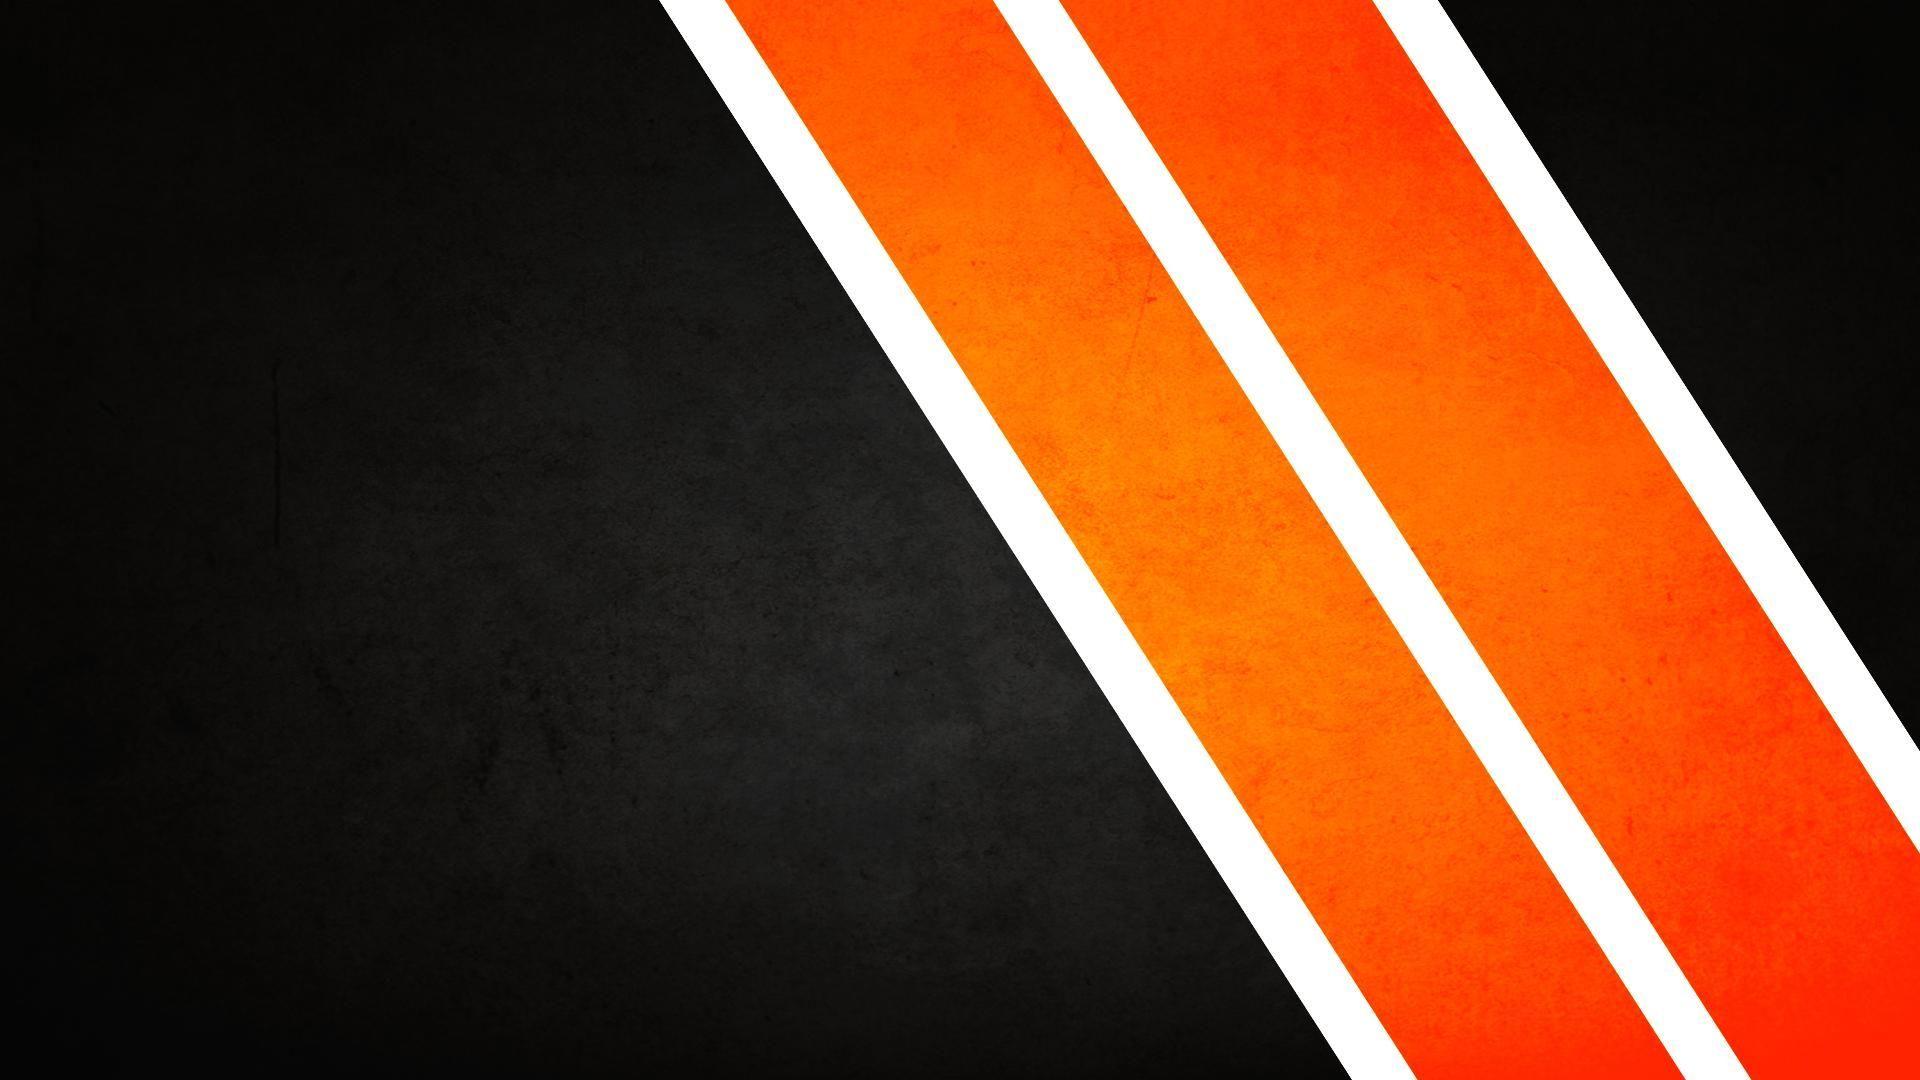 Black And Orange Wallpaper 19   [1920x1080] 1920x1080